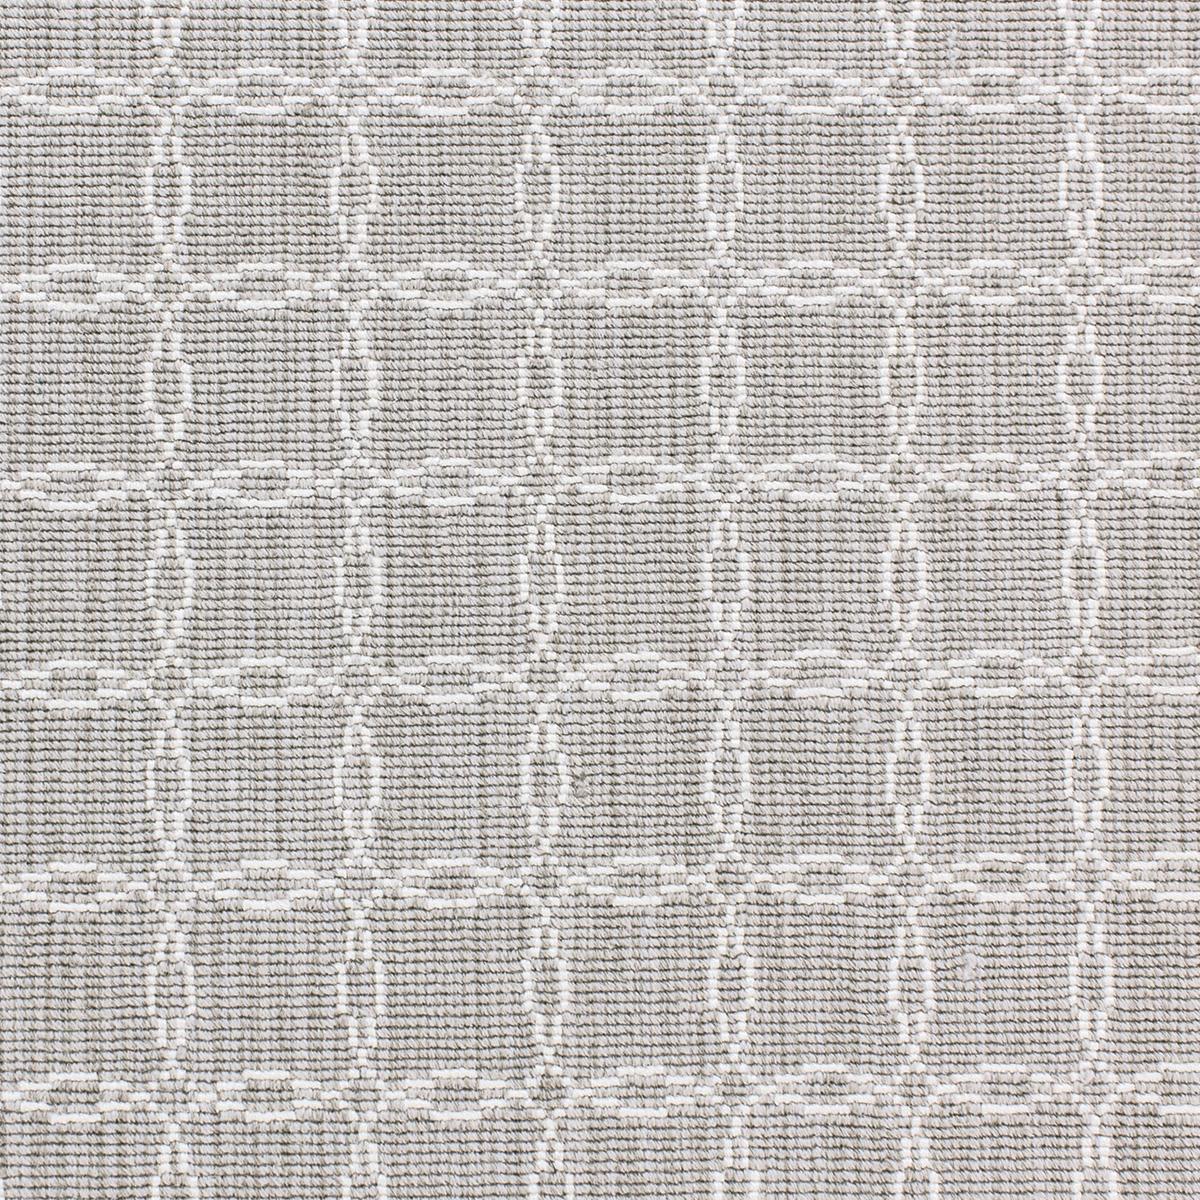 cheslock_wool-nylon_broadloom_patterson-flynn-martin_pfm